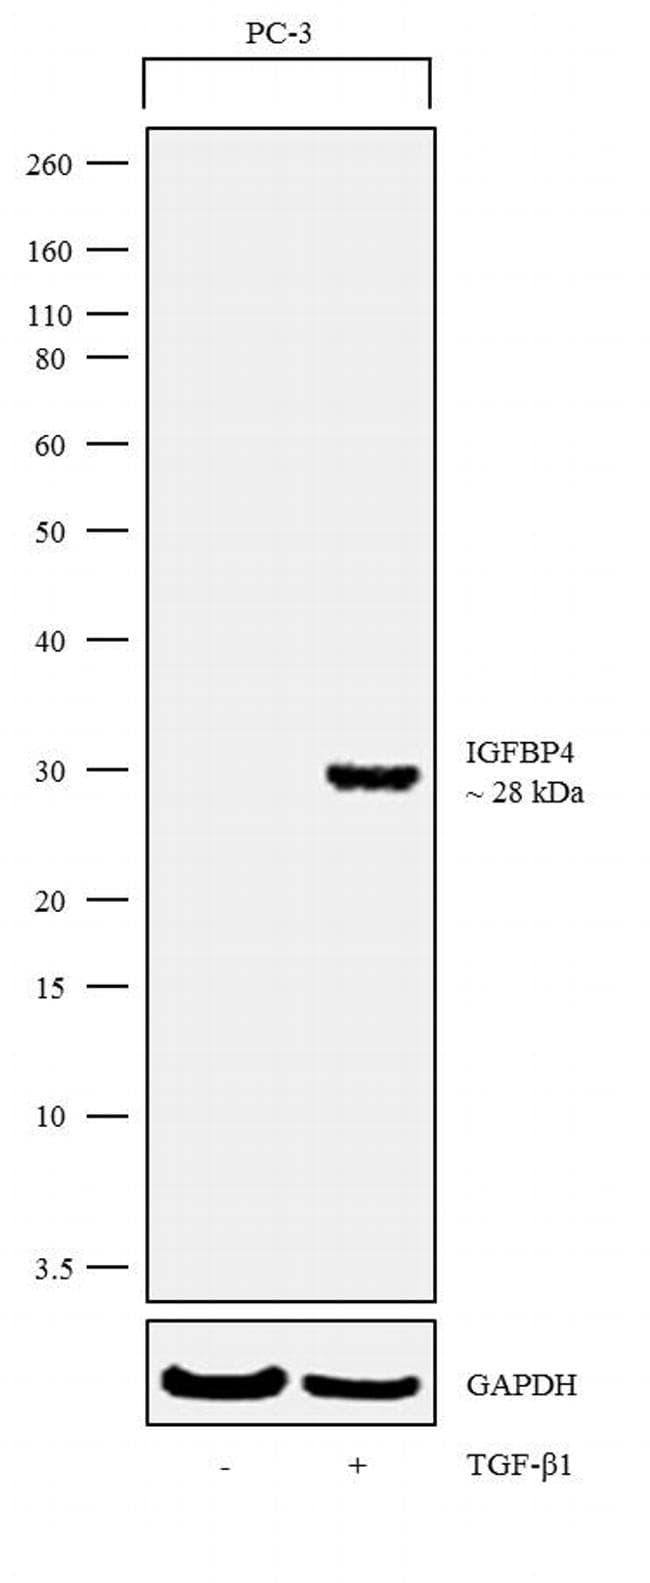 IGFBP4 Antibody in Cell treatment